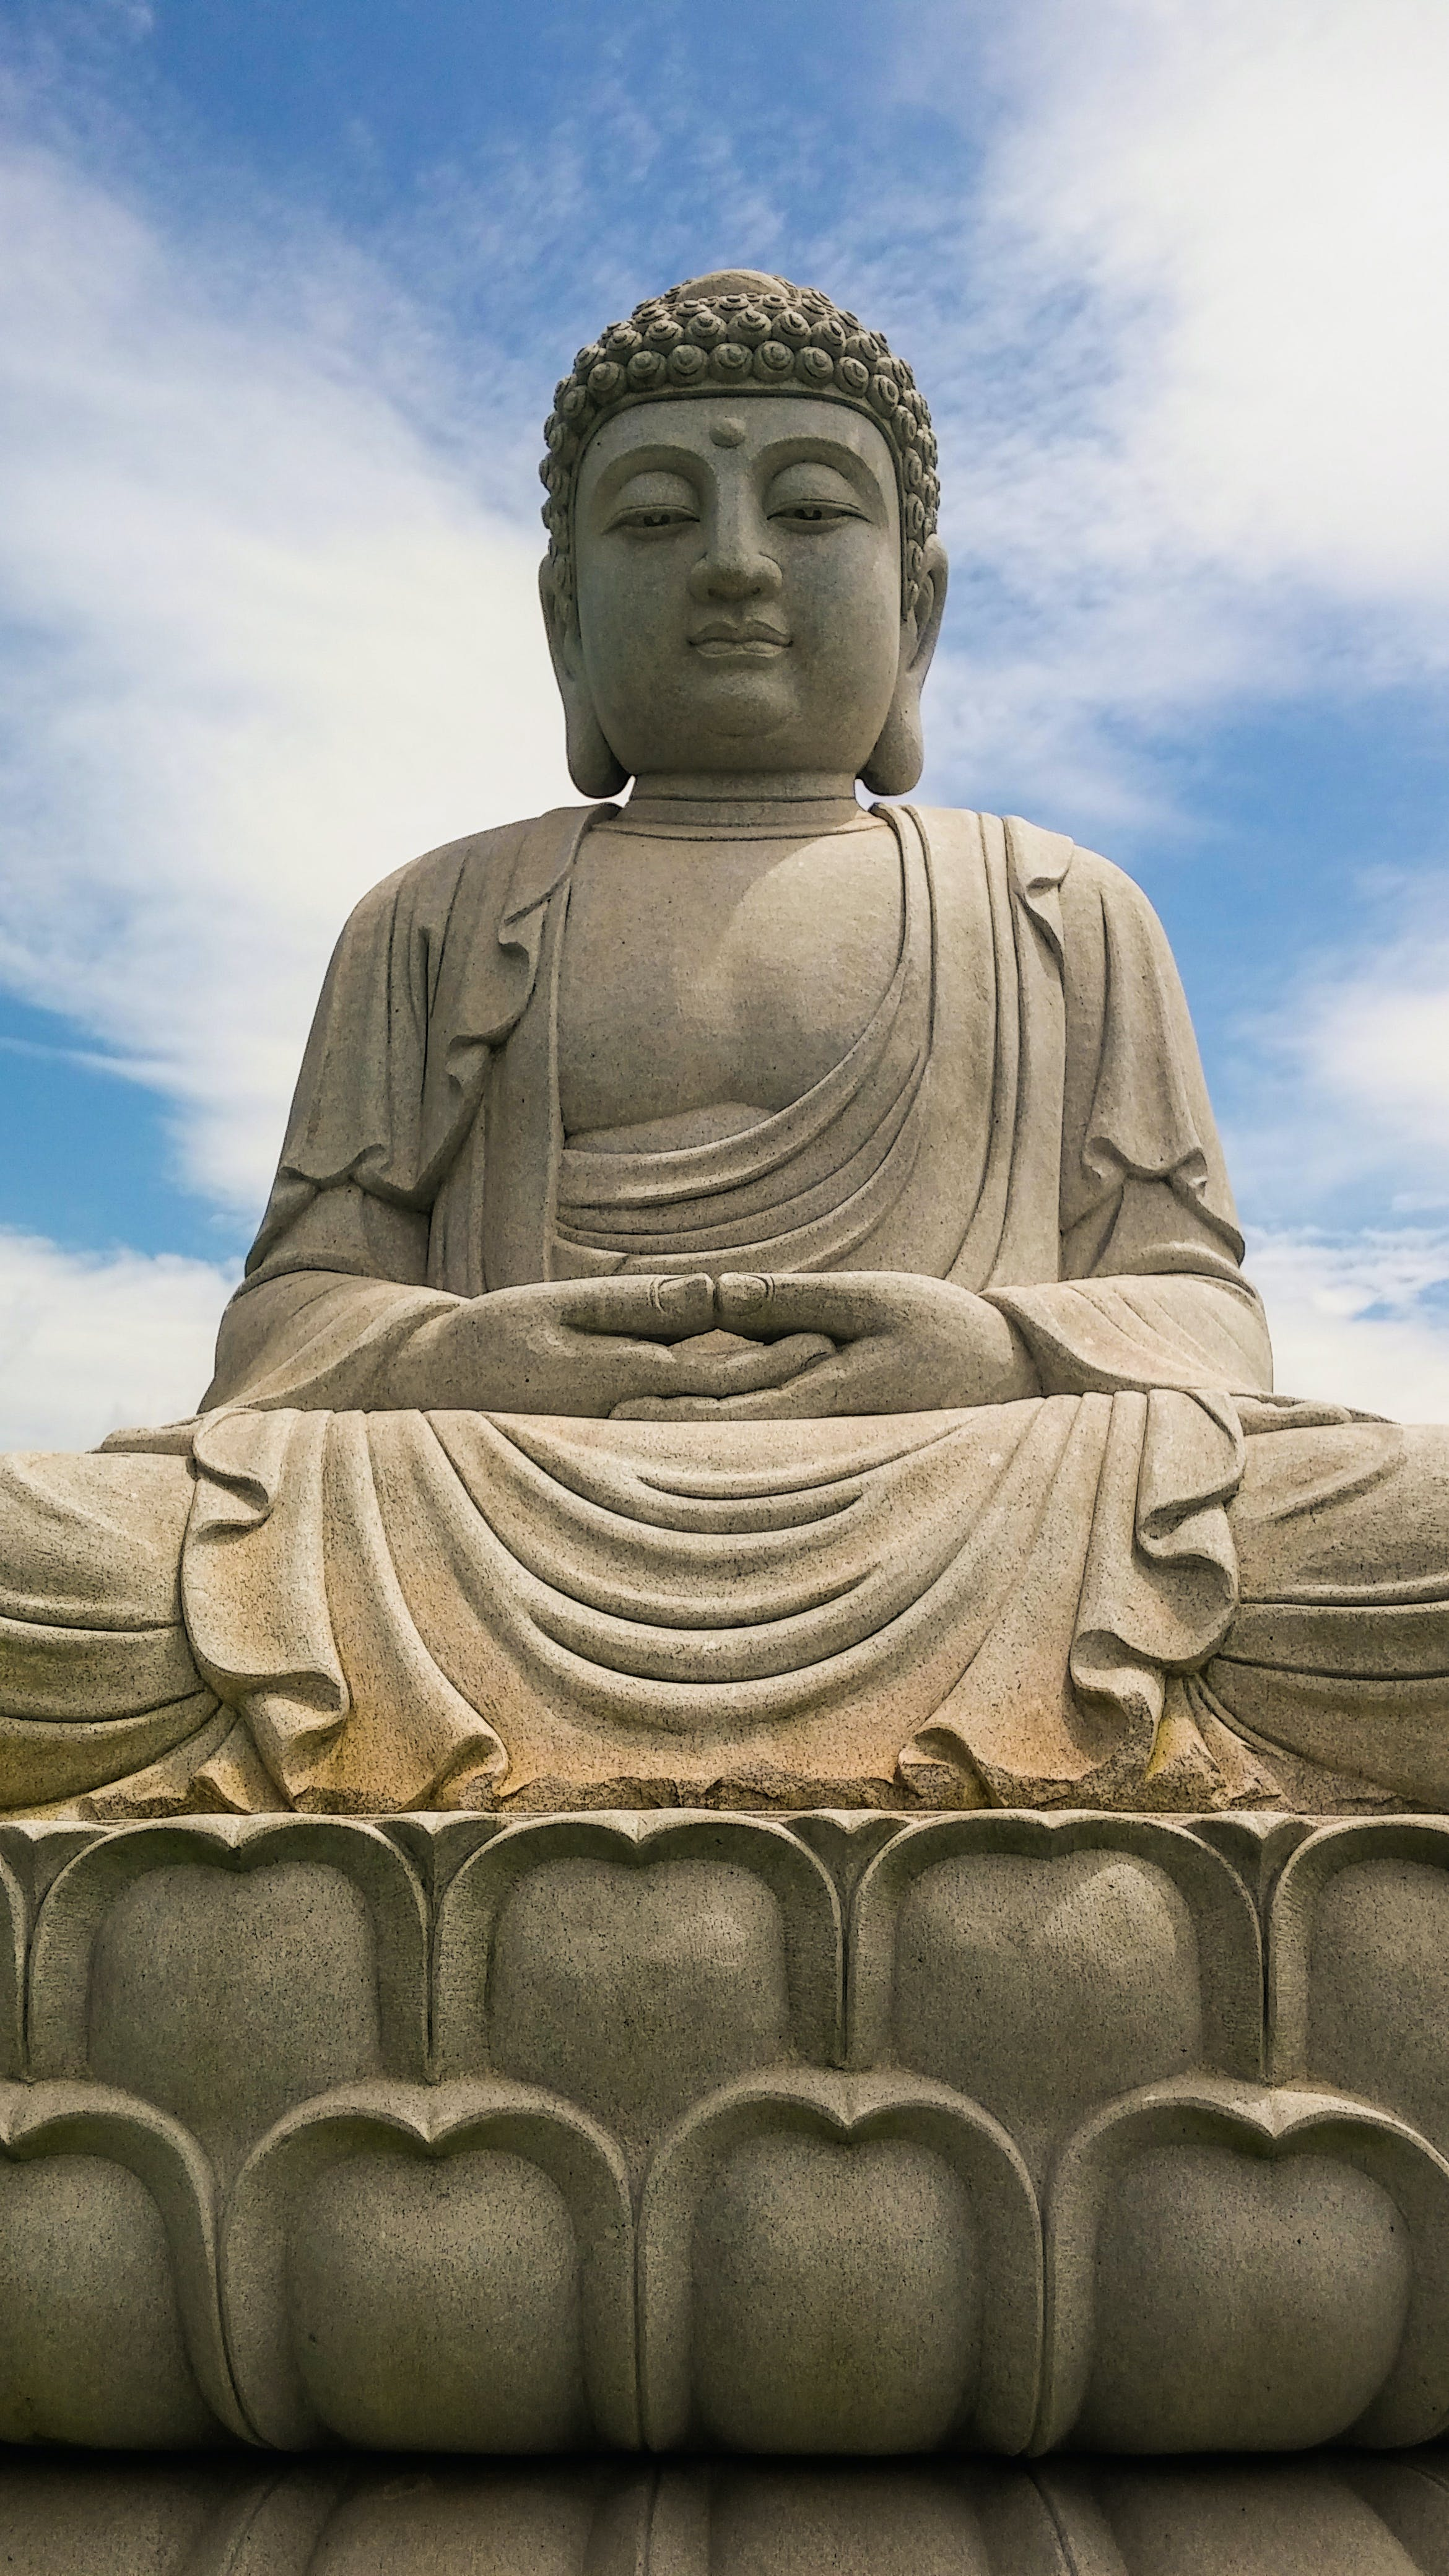 Gratis lagerfoto af arkitektur, asiatisk, Asien, buddha